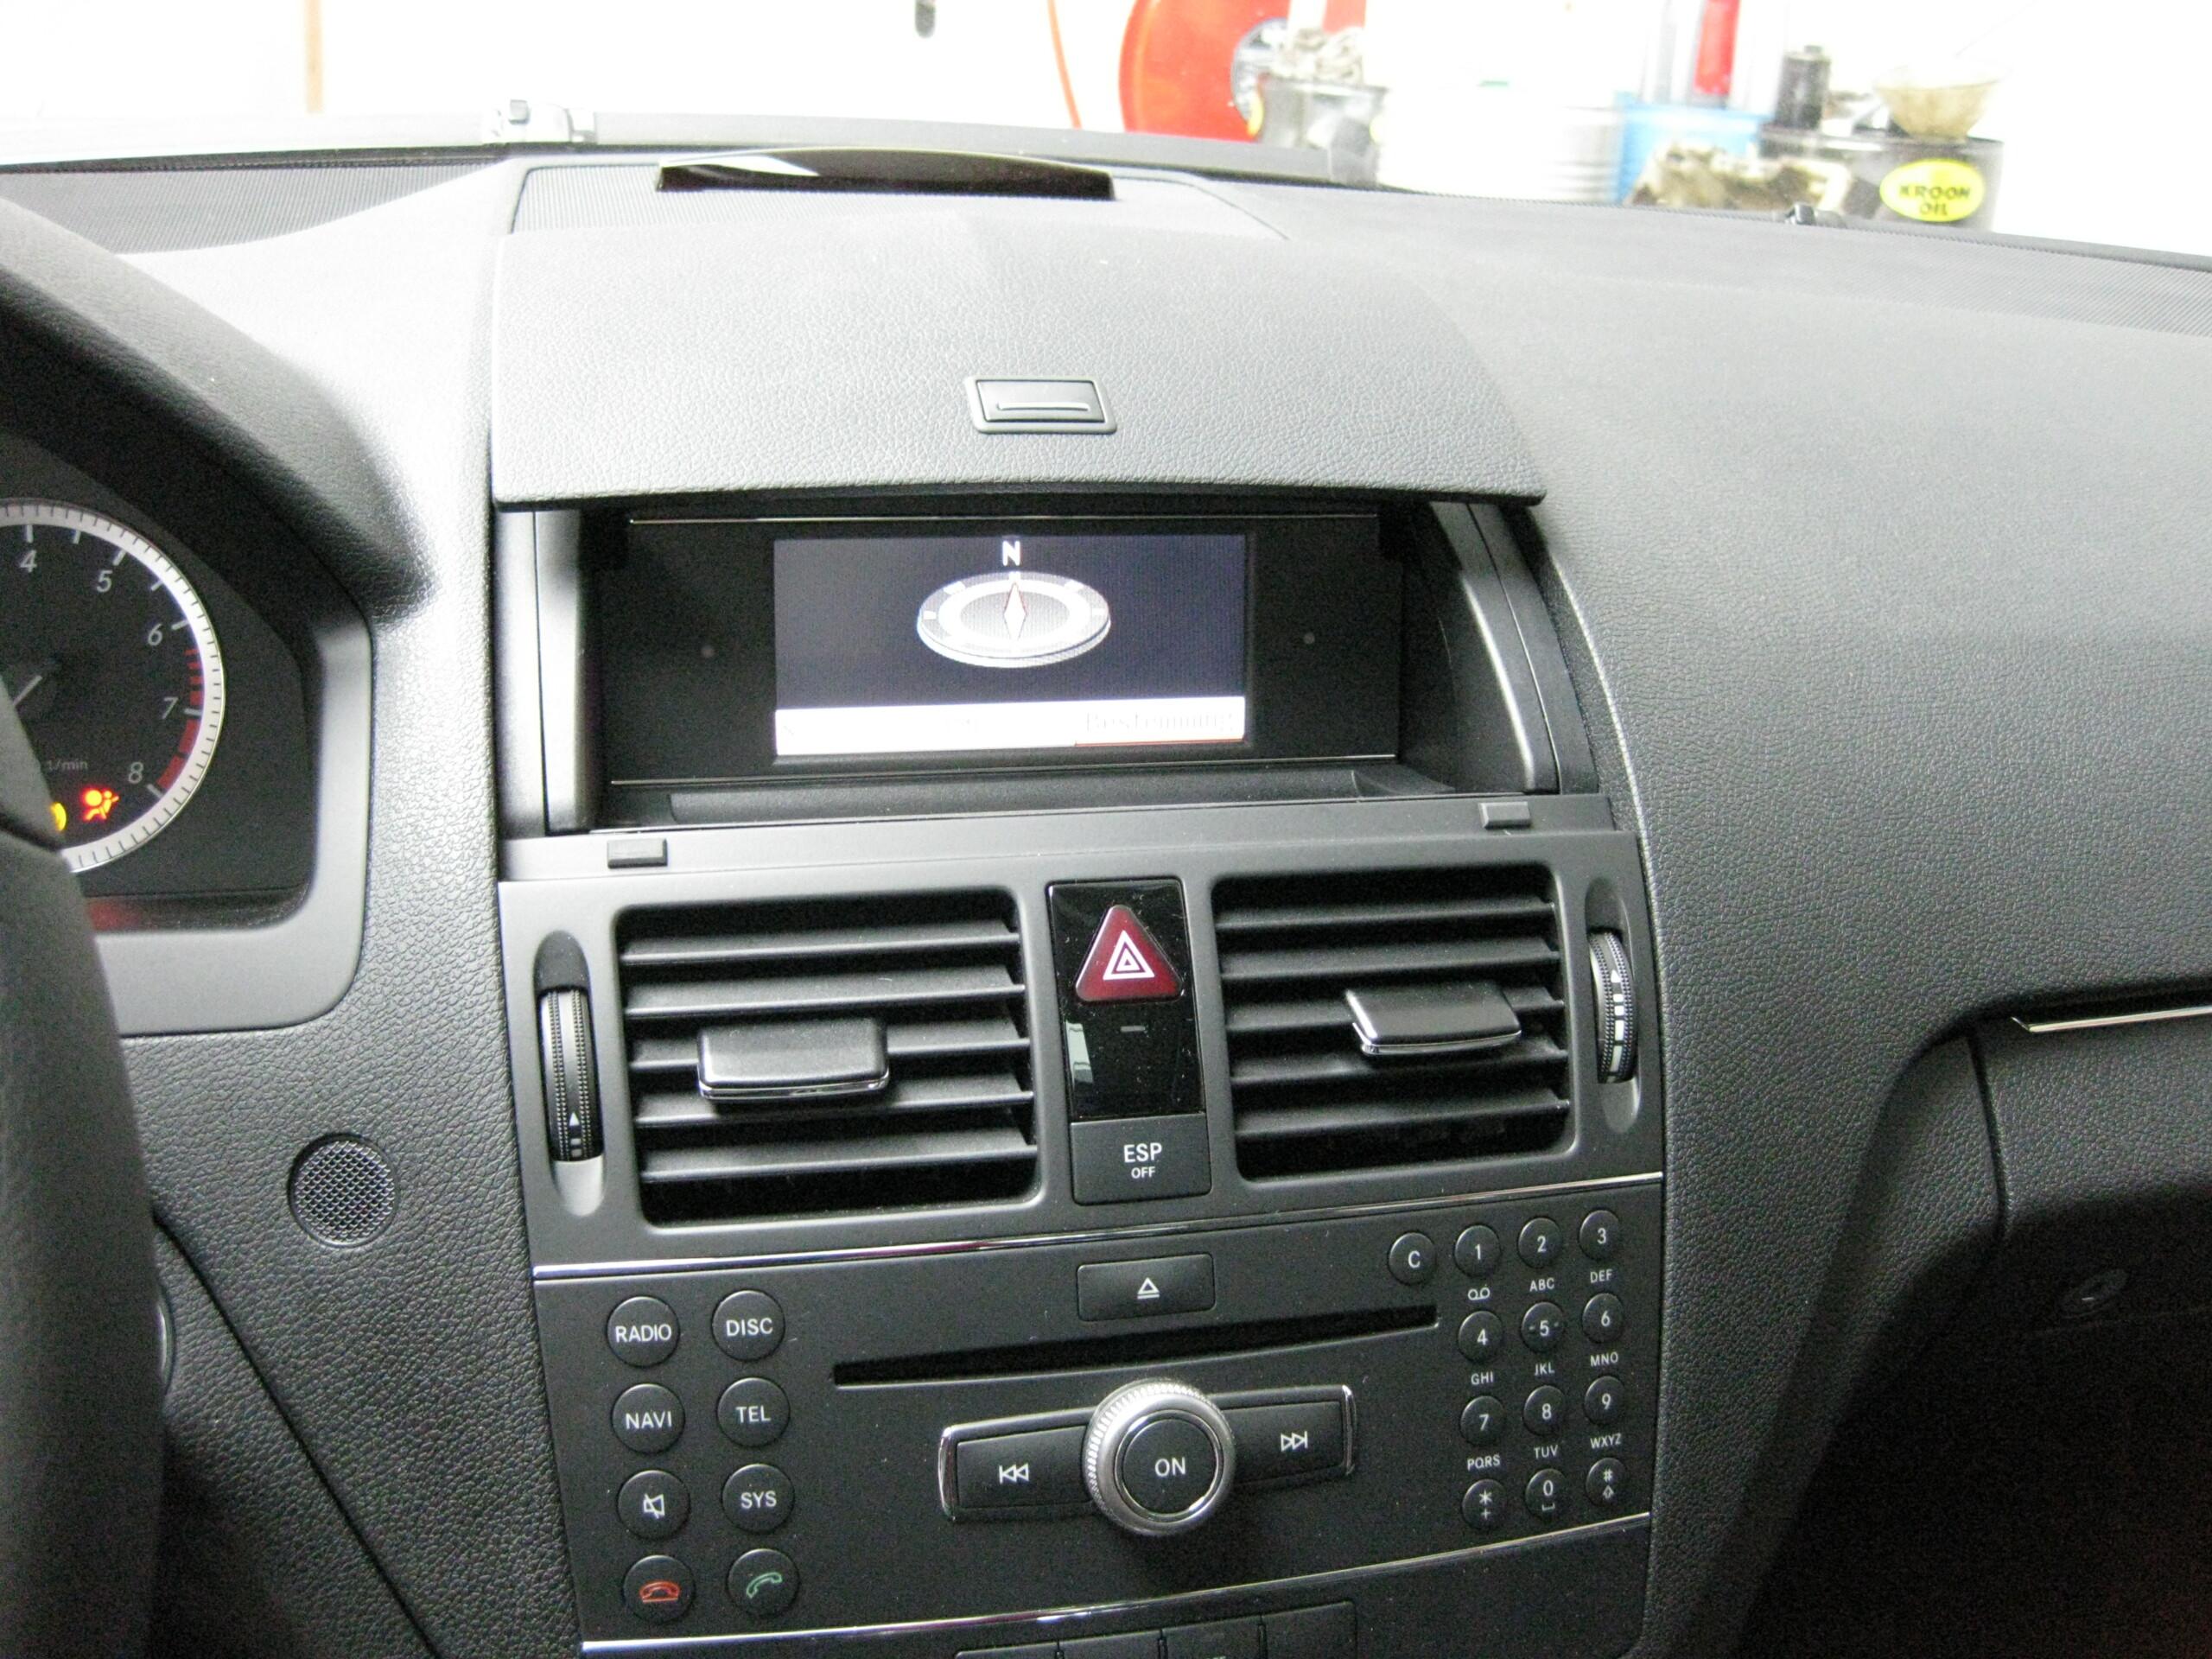 Mercedes APS 50 NTG4